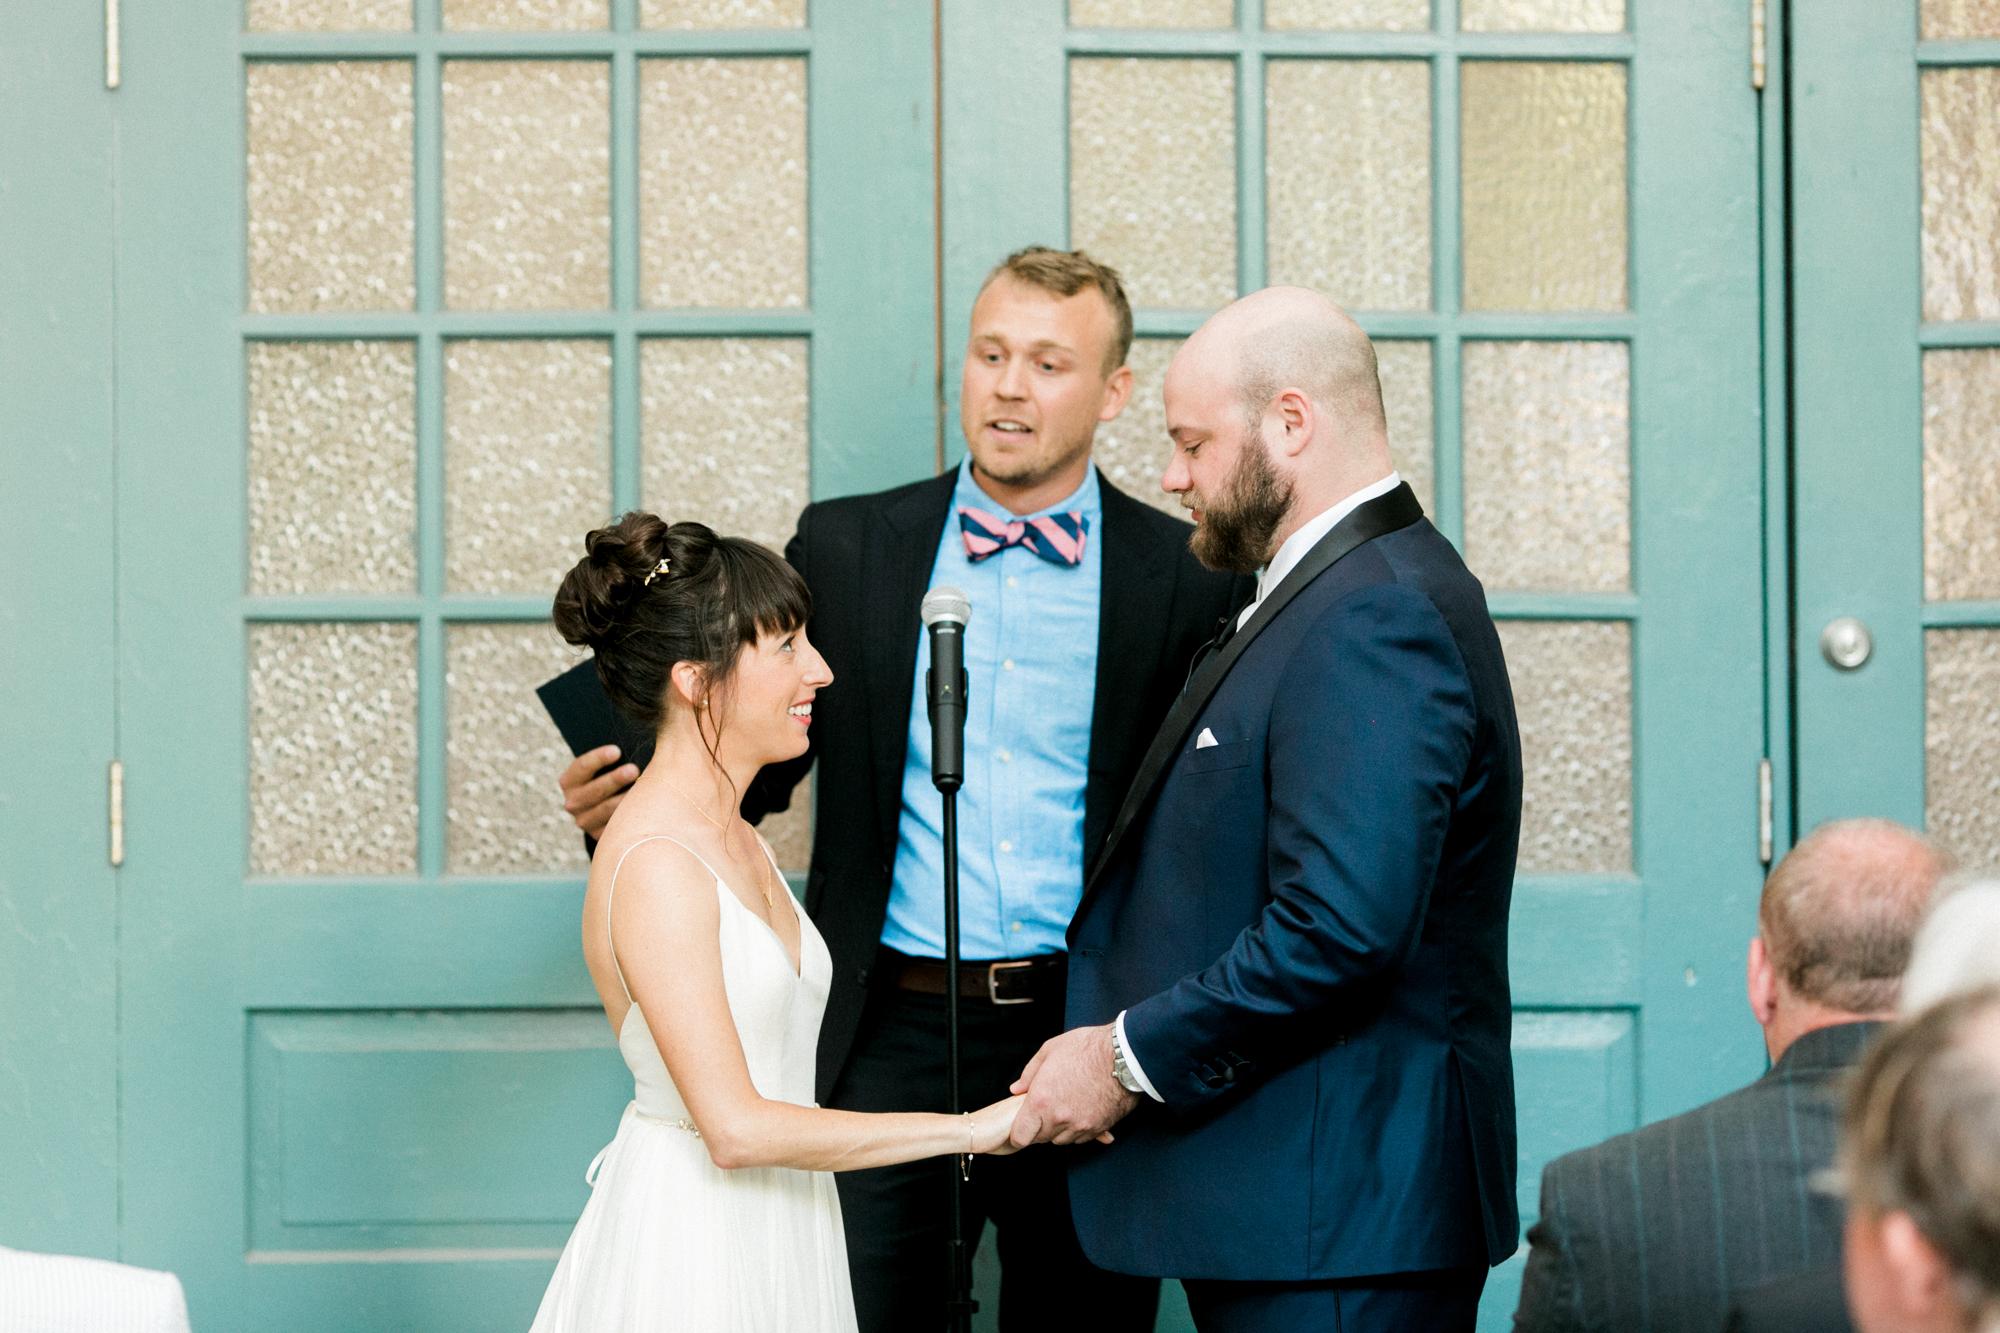 haley-richter-photography-maas-building-summer-wedding-philadelphia-DIY-birchtree-153.jpg